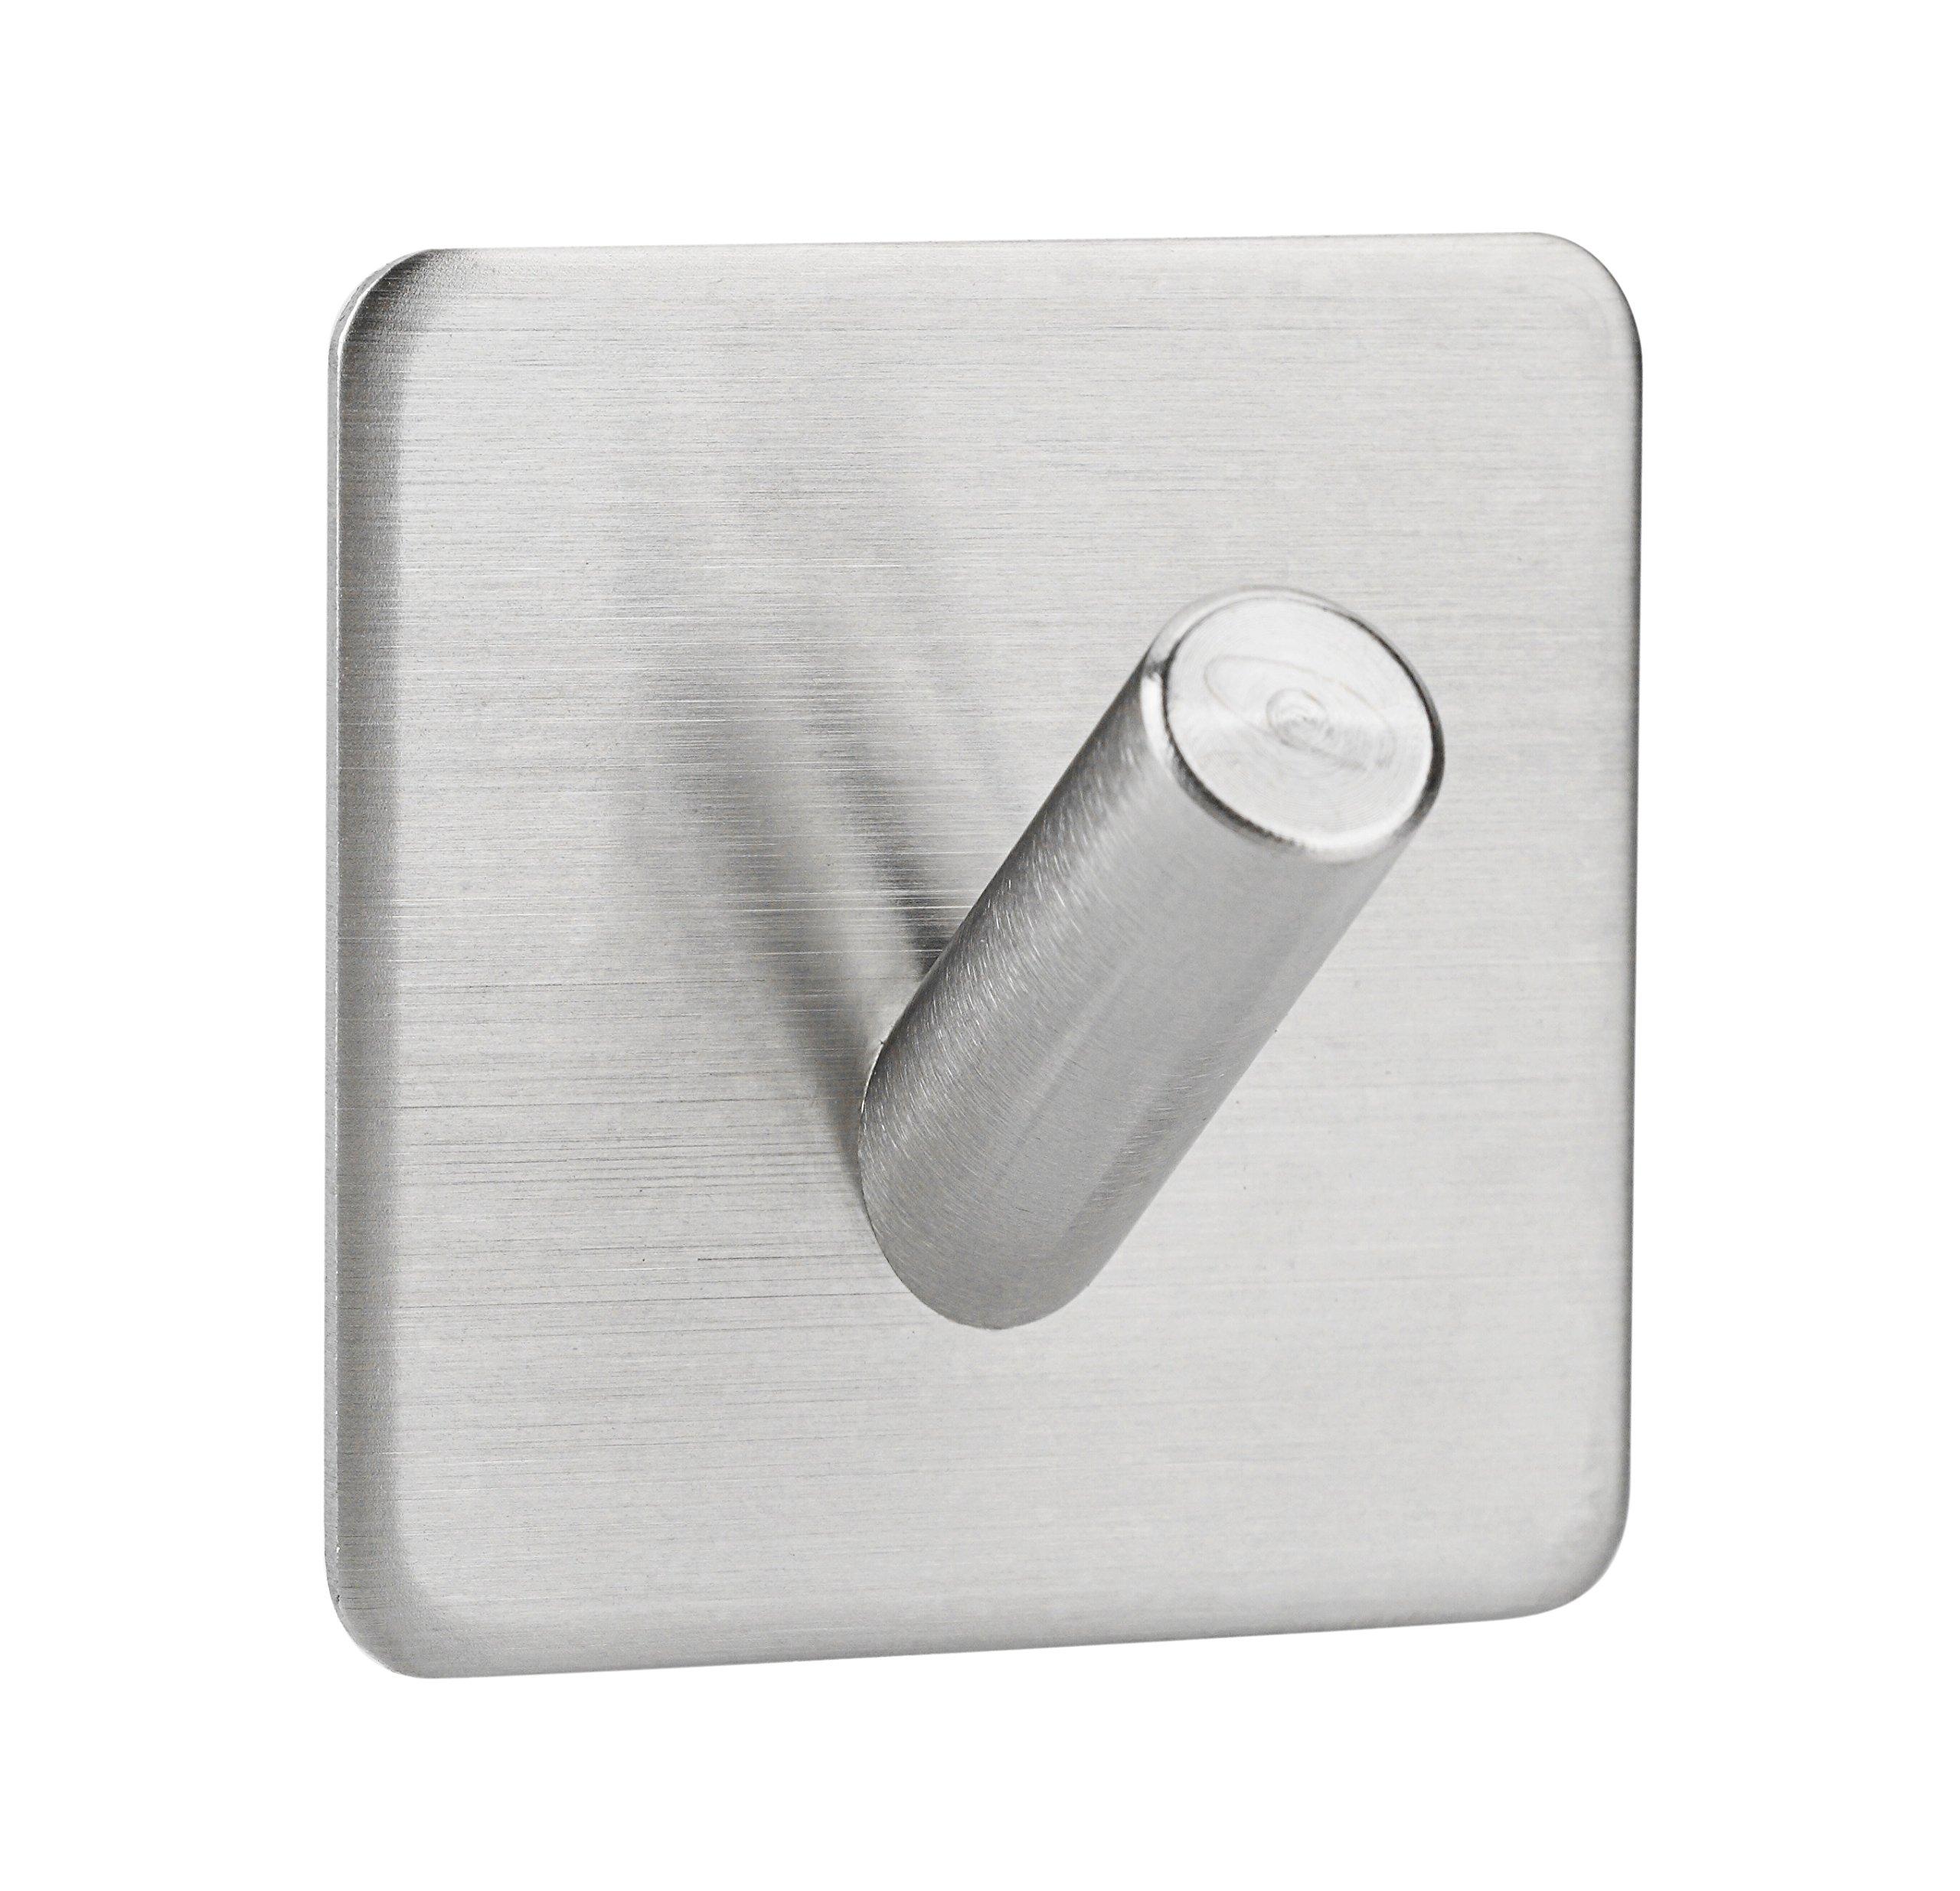 CP 304 Stainless Steel 3M Self Adhesive Hook Key Rack Garage Storage Organizer Bathroom Kitchen Towel Hanger Wall Mount, No drill required (1)